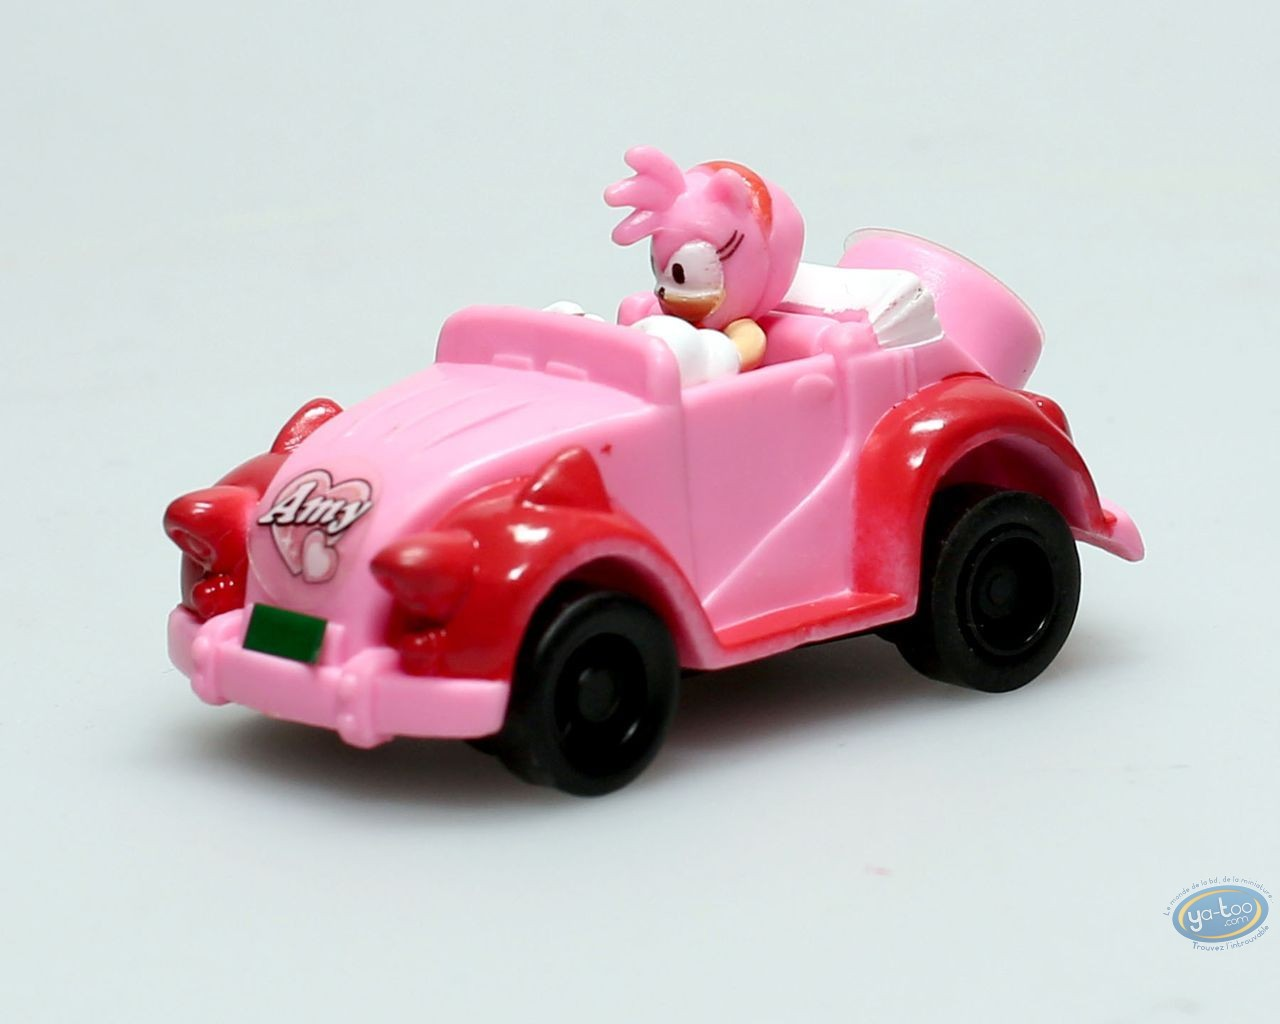 Figurine plastique, Sonic : Amy en voiture